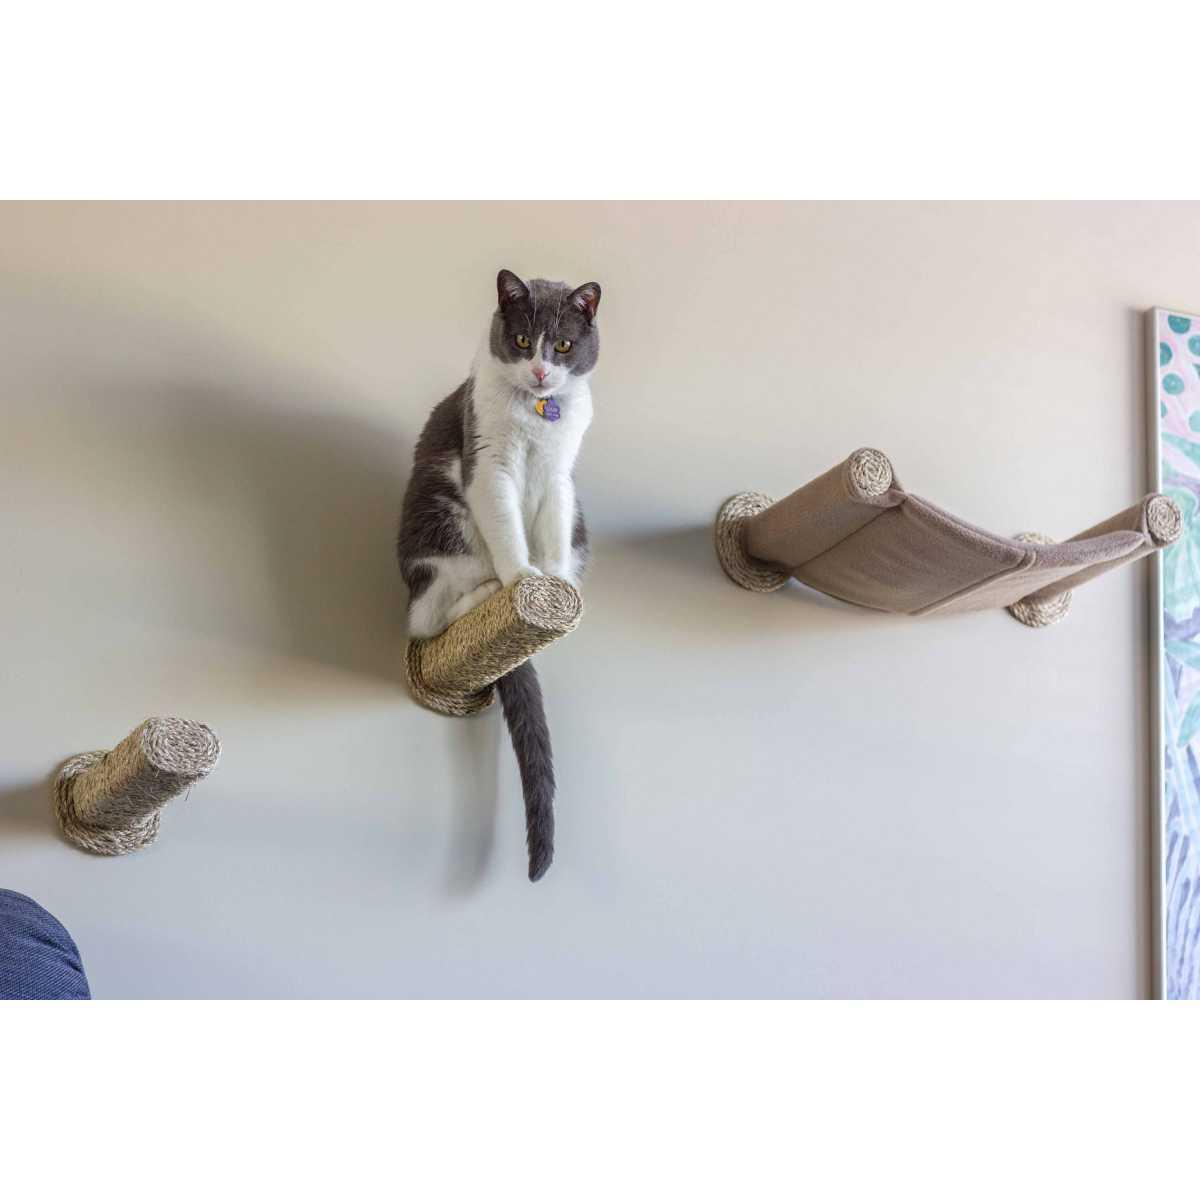 cat hammock   wall mounted cat bed   with 2 sisal steps hammock   wall mounted cat bed   with 2 sisal steps  rh   catwallshelves